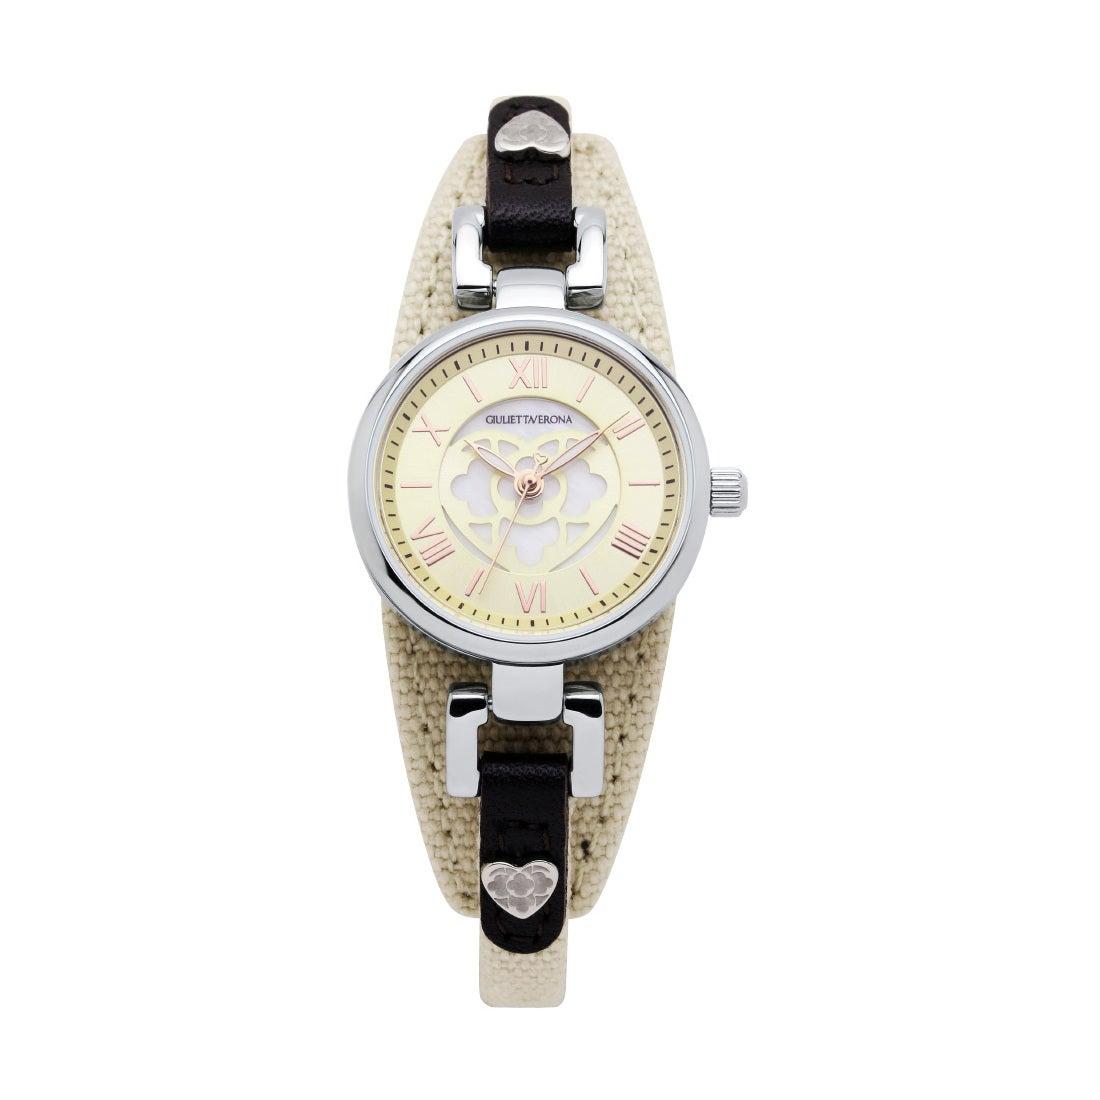 【SAC'S BAR】ジュリエッタヴェローナ GIULIETTAVERONA 腕時計 GV005 PRIMA DONNA アイボリー×アイボリー